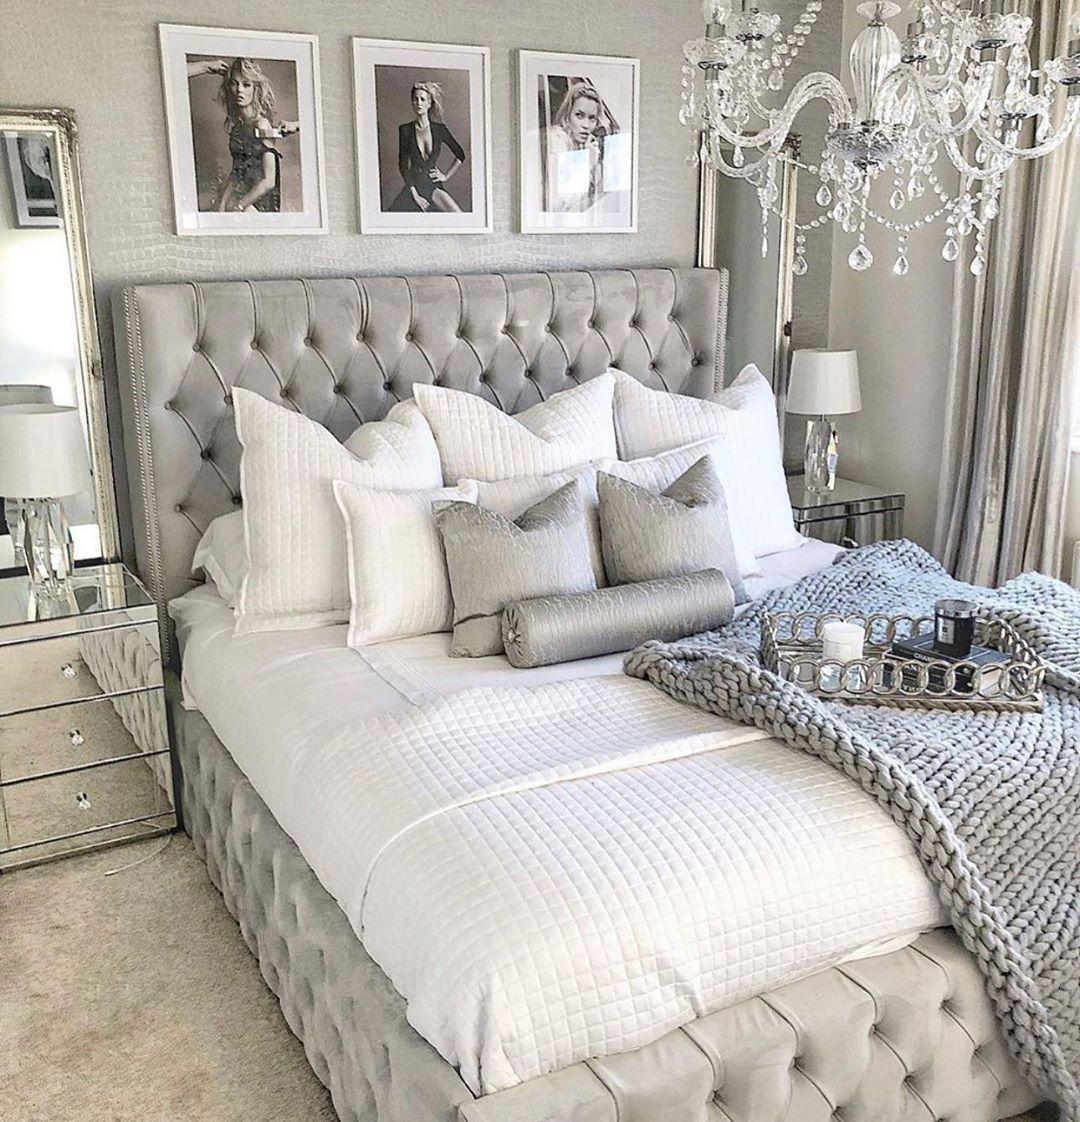 Incredible 25 Beegcom Best School Of Interior Design London Luxurious Bedrooms Bedroom Decor Home